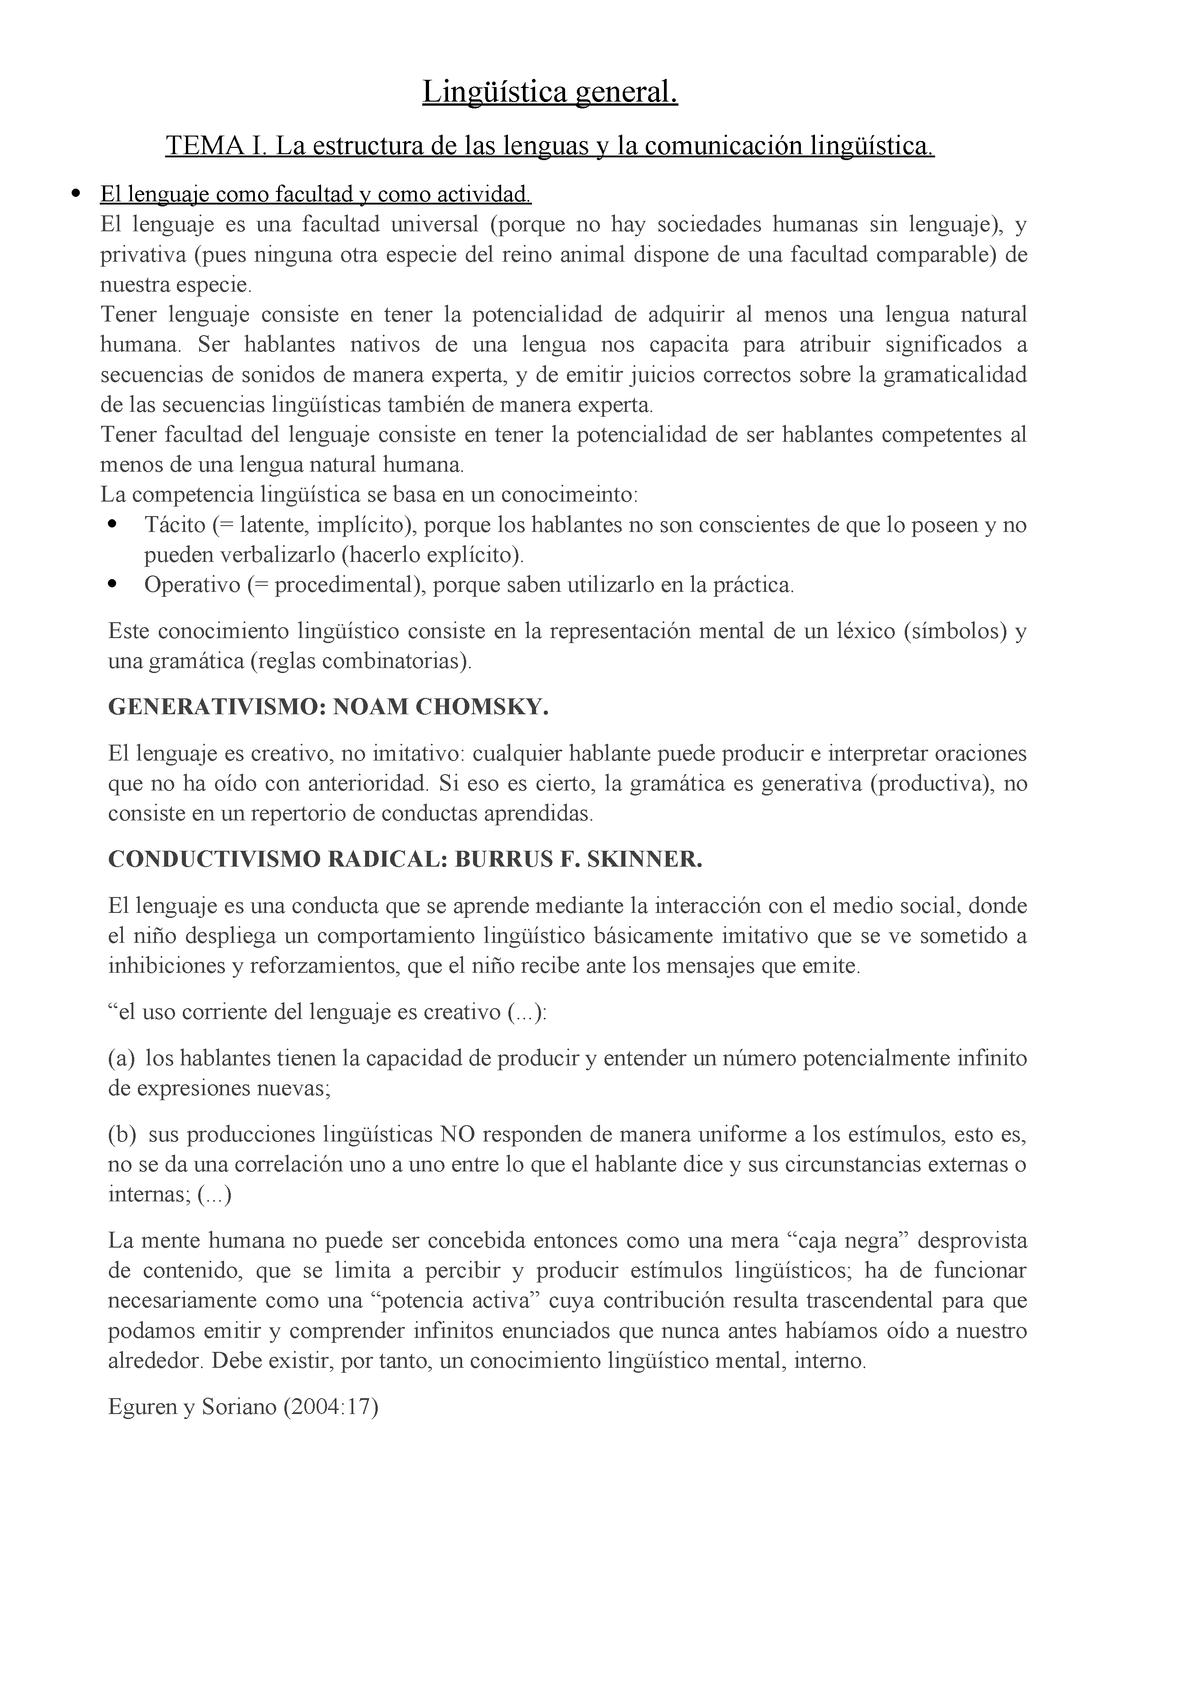 Tema I Apuntes 1 Lingüística Glemol01 1 015 Uniovi